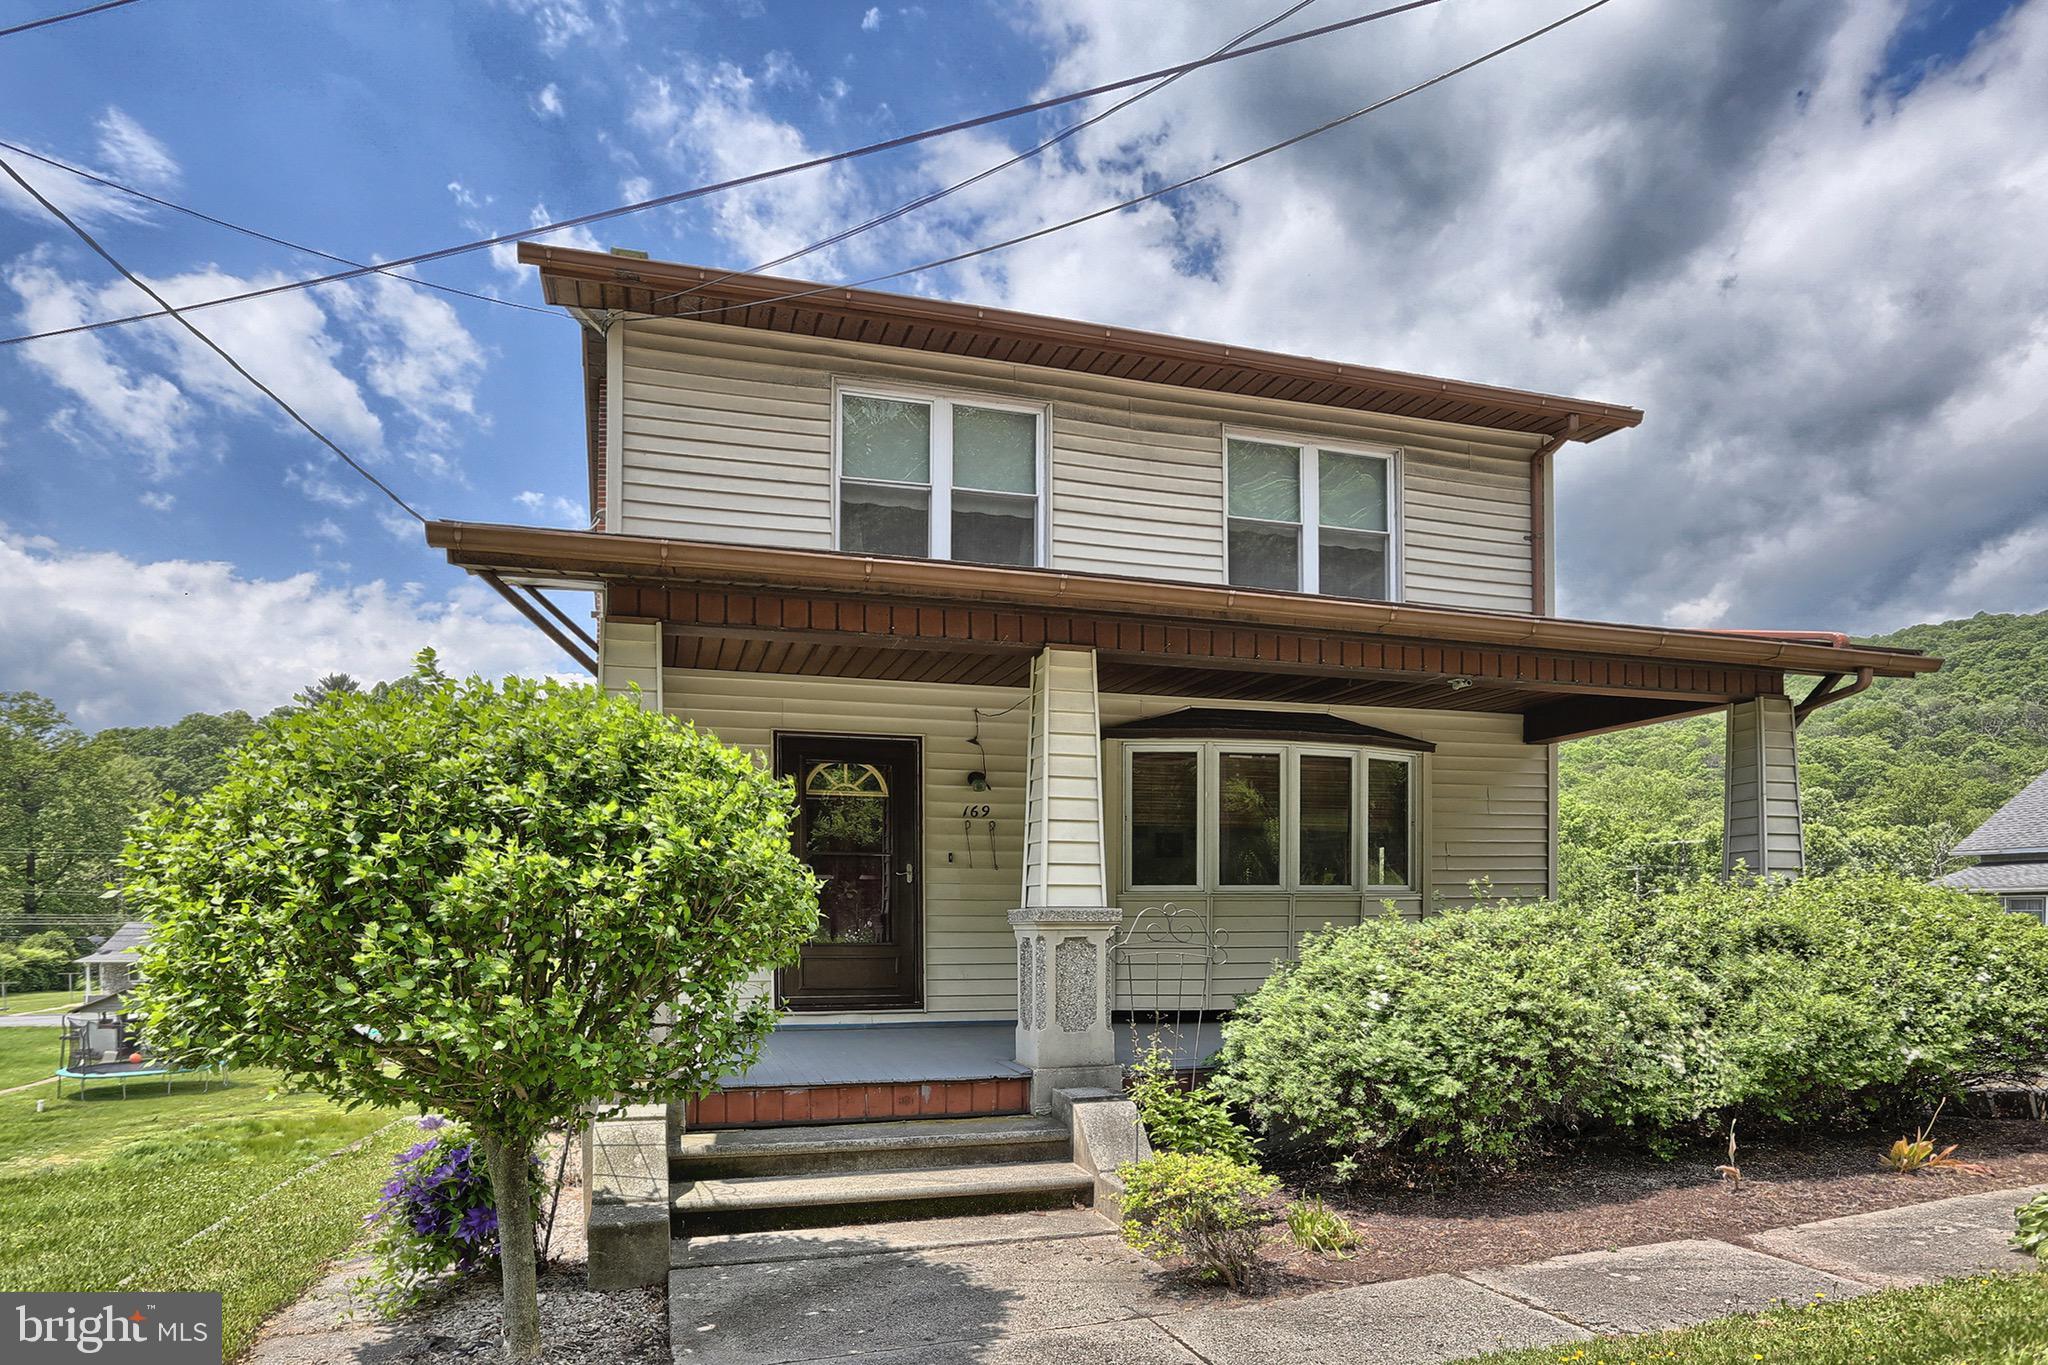 169 CENTRE STREET, PORT CLINTON, PA 19549